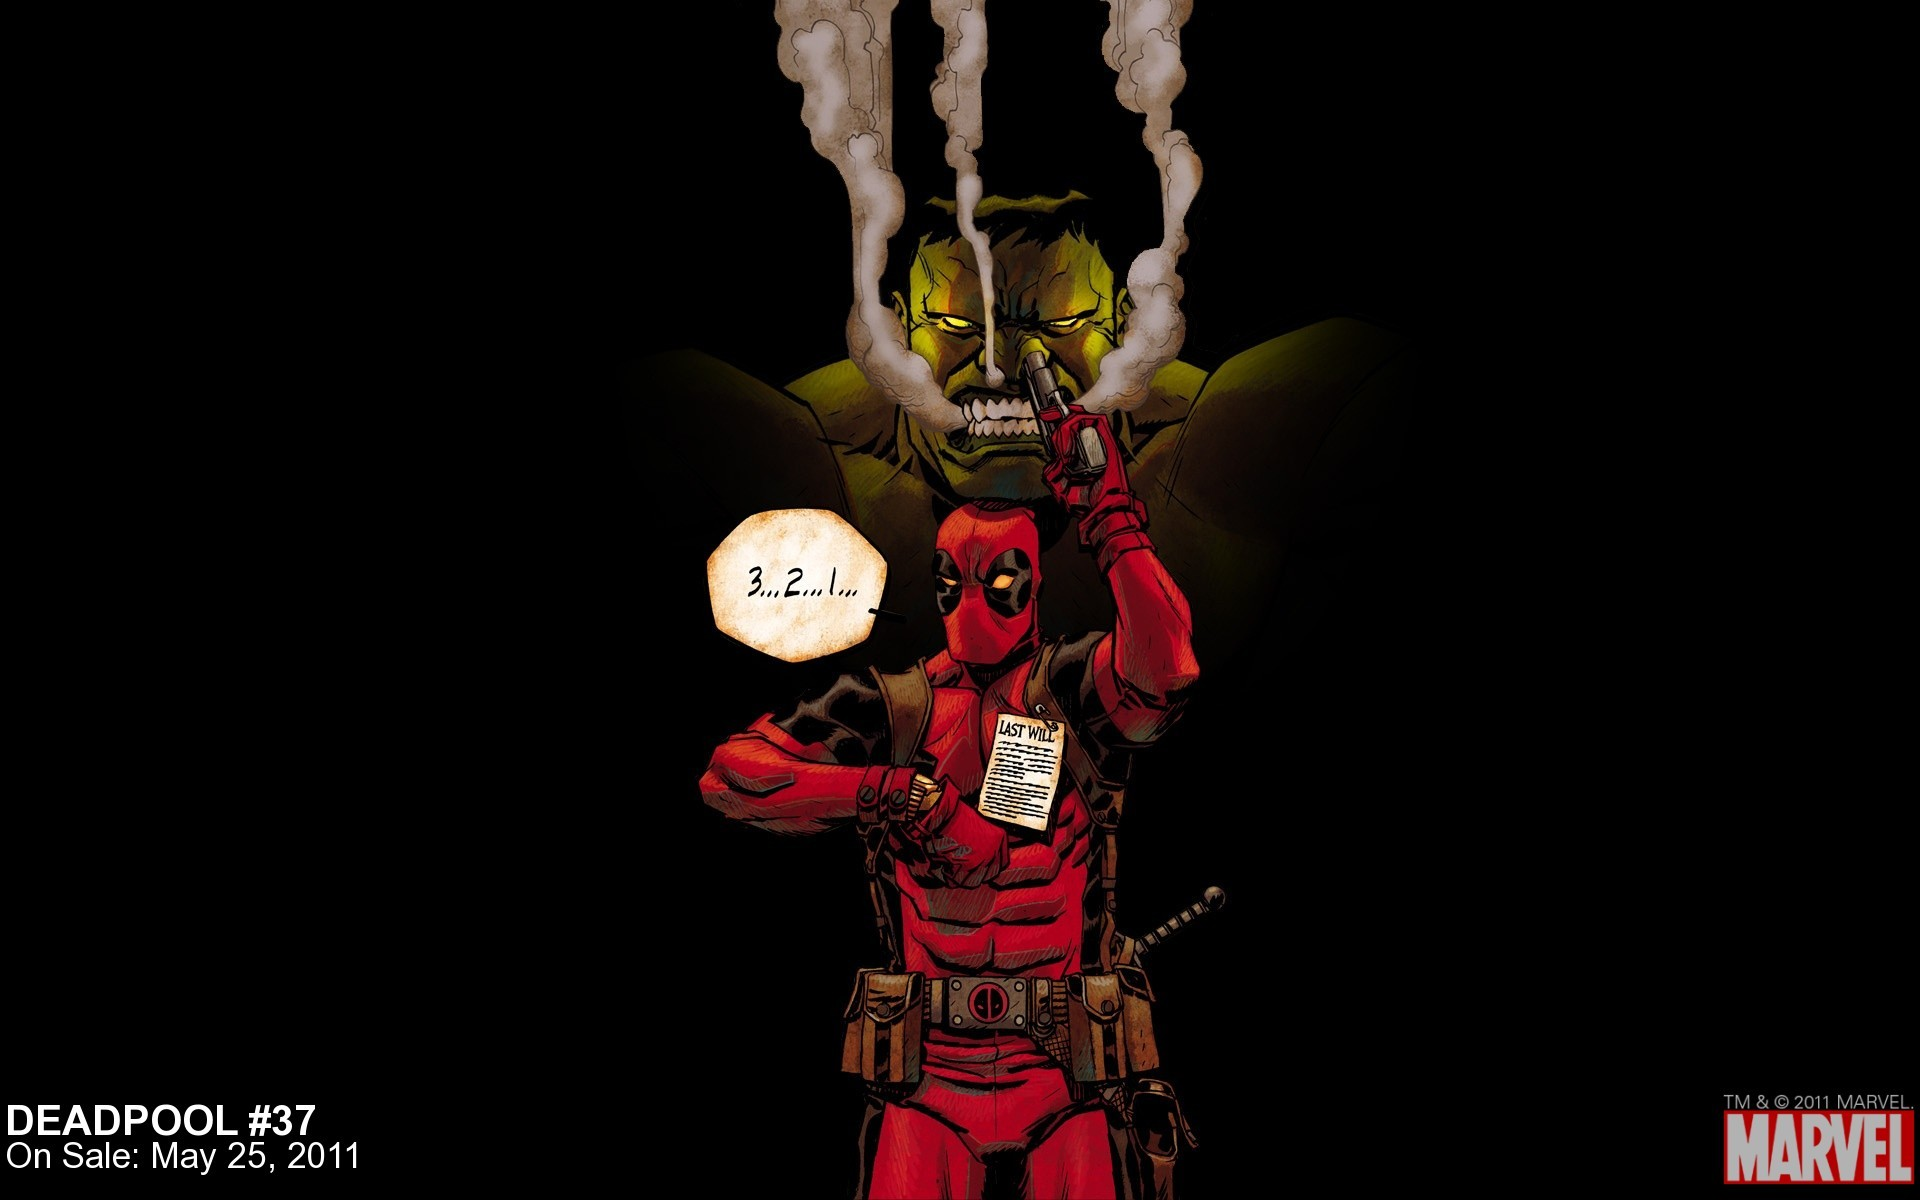 Hulk Comic Character Comics Deadpool Wade Wilson Marvel